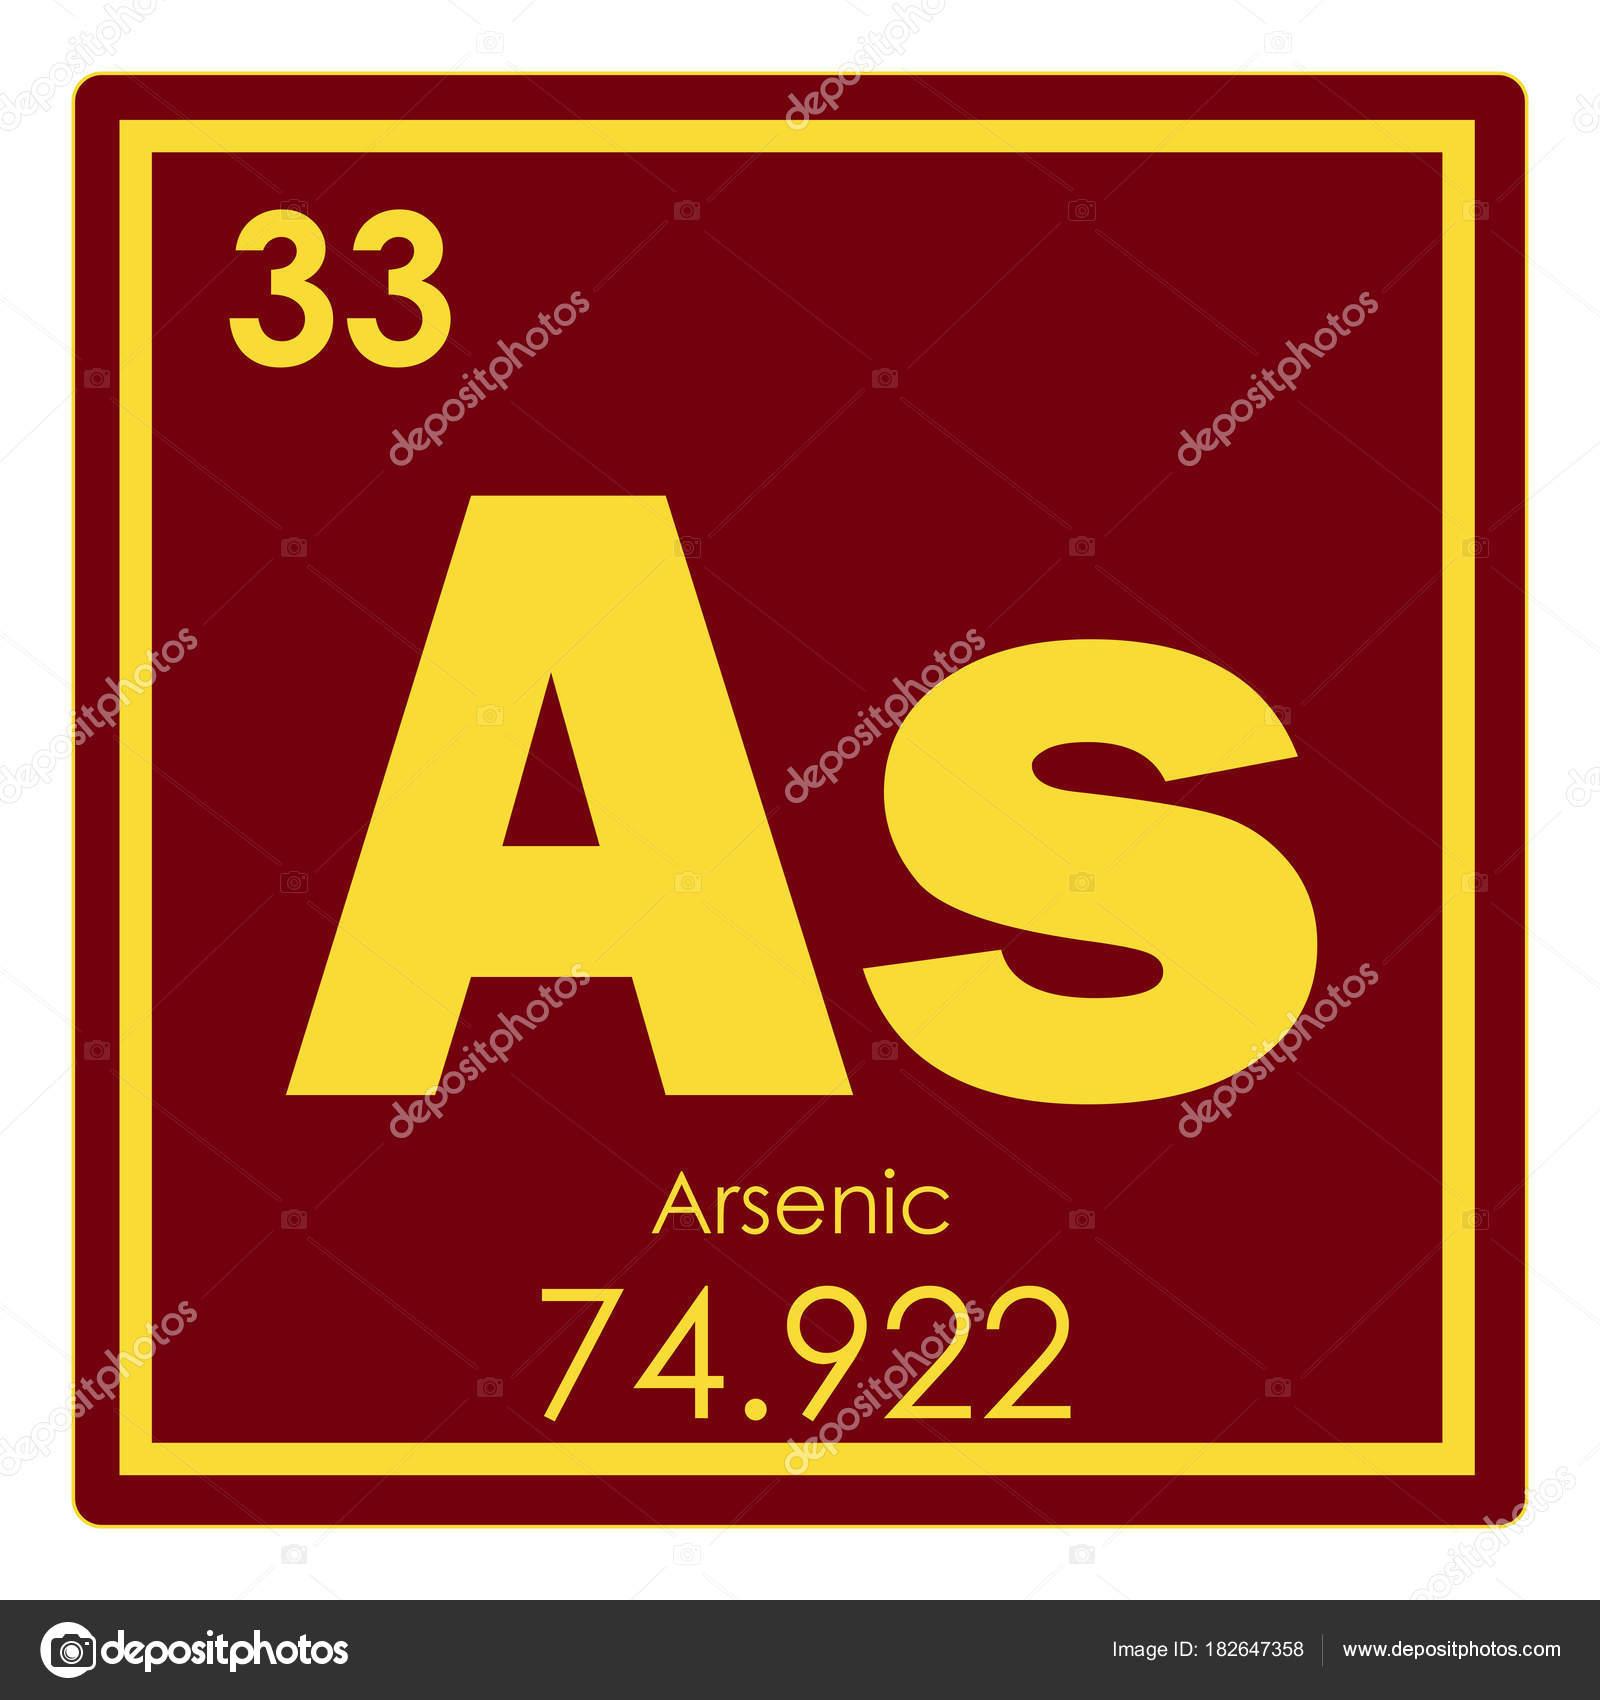 Arsnico elemento qumico foto de stock tony4urban 182647358 smbolo de la ciencia de arsnico elemento qumico tabla peridica foto de tony4urban urtaz Gallery